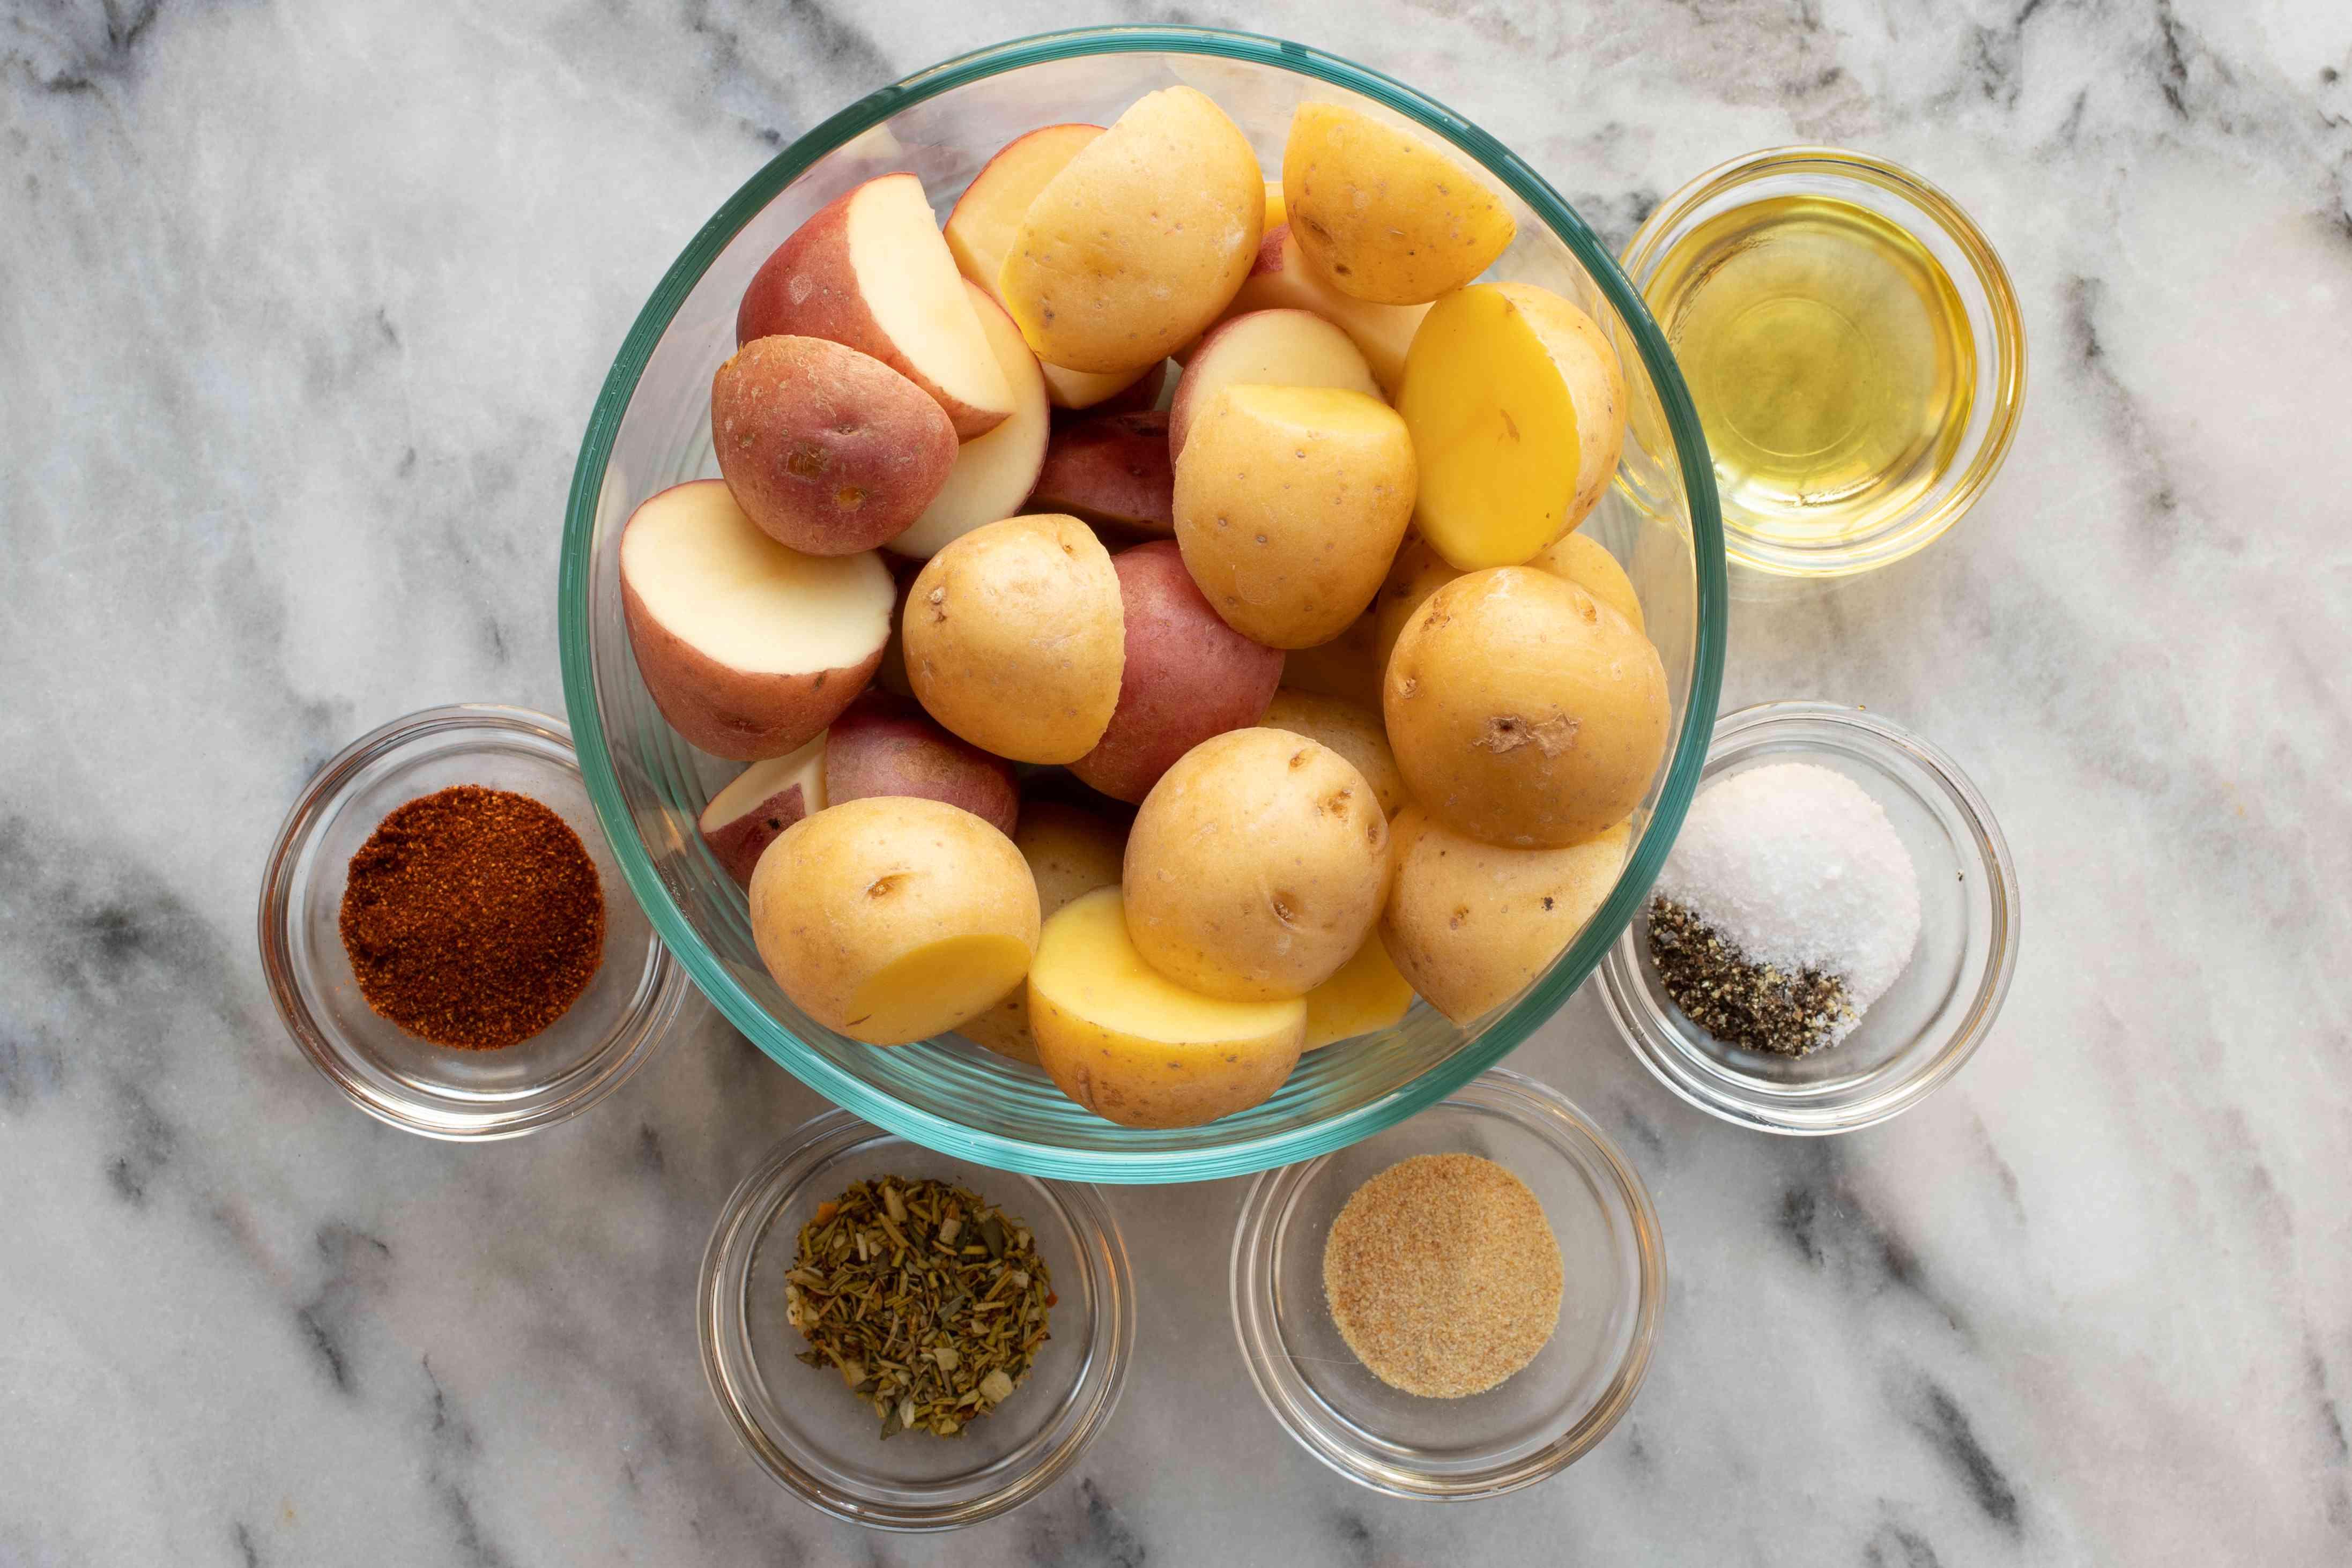 Ingredients for air fryer potatoes